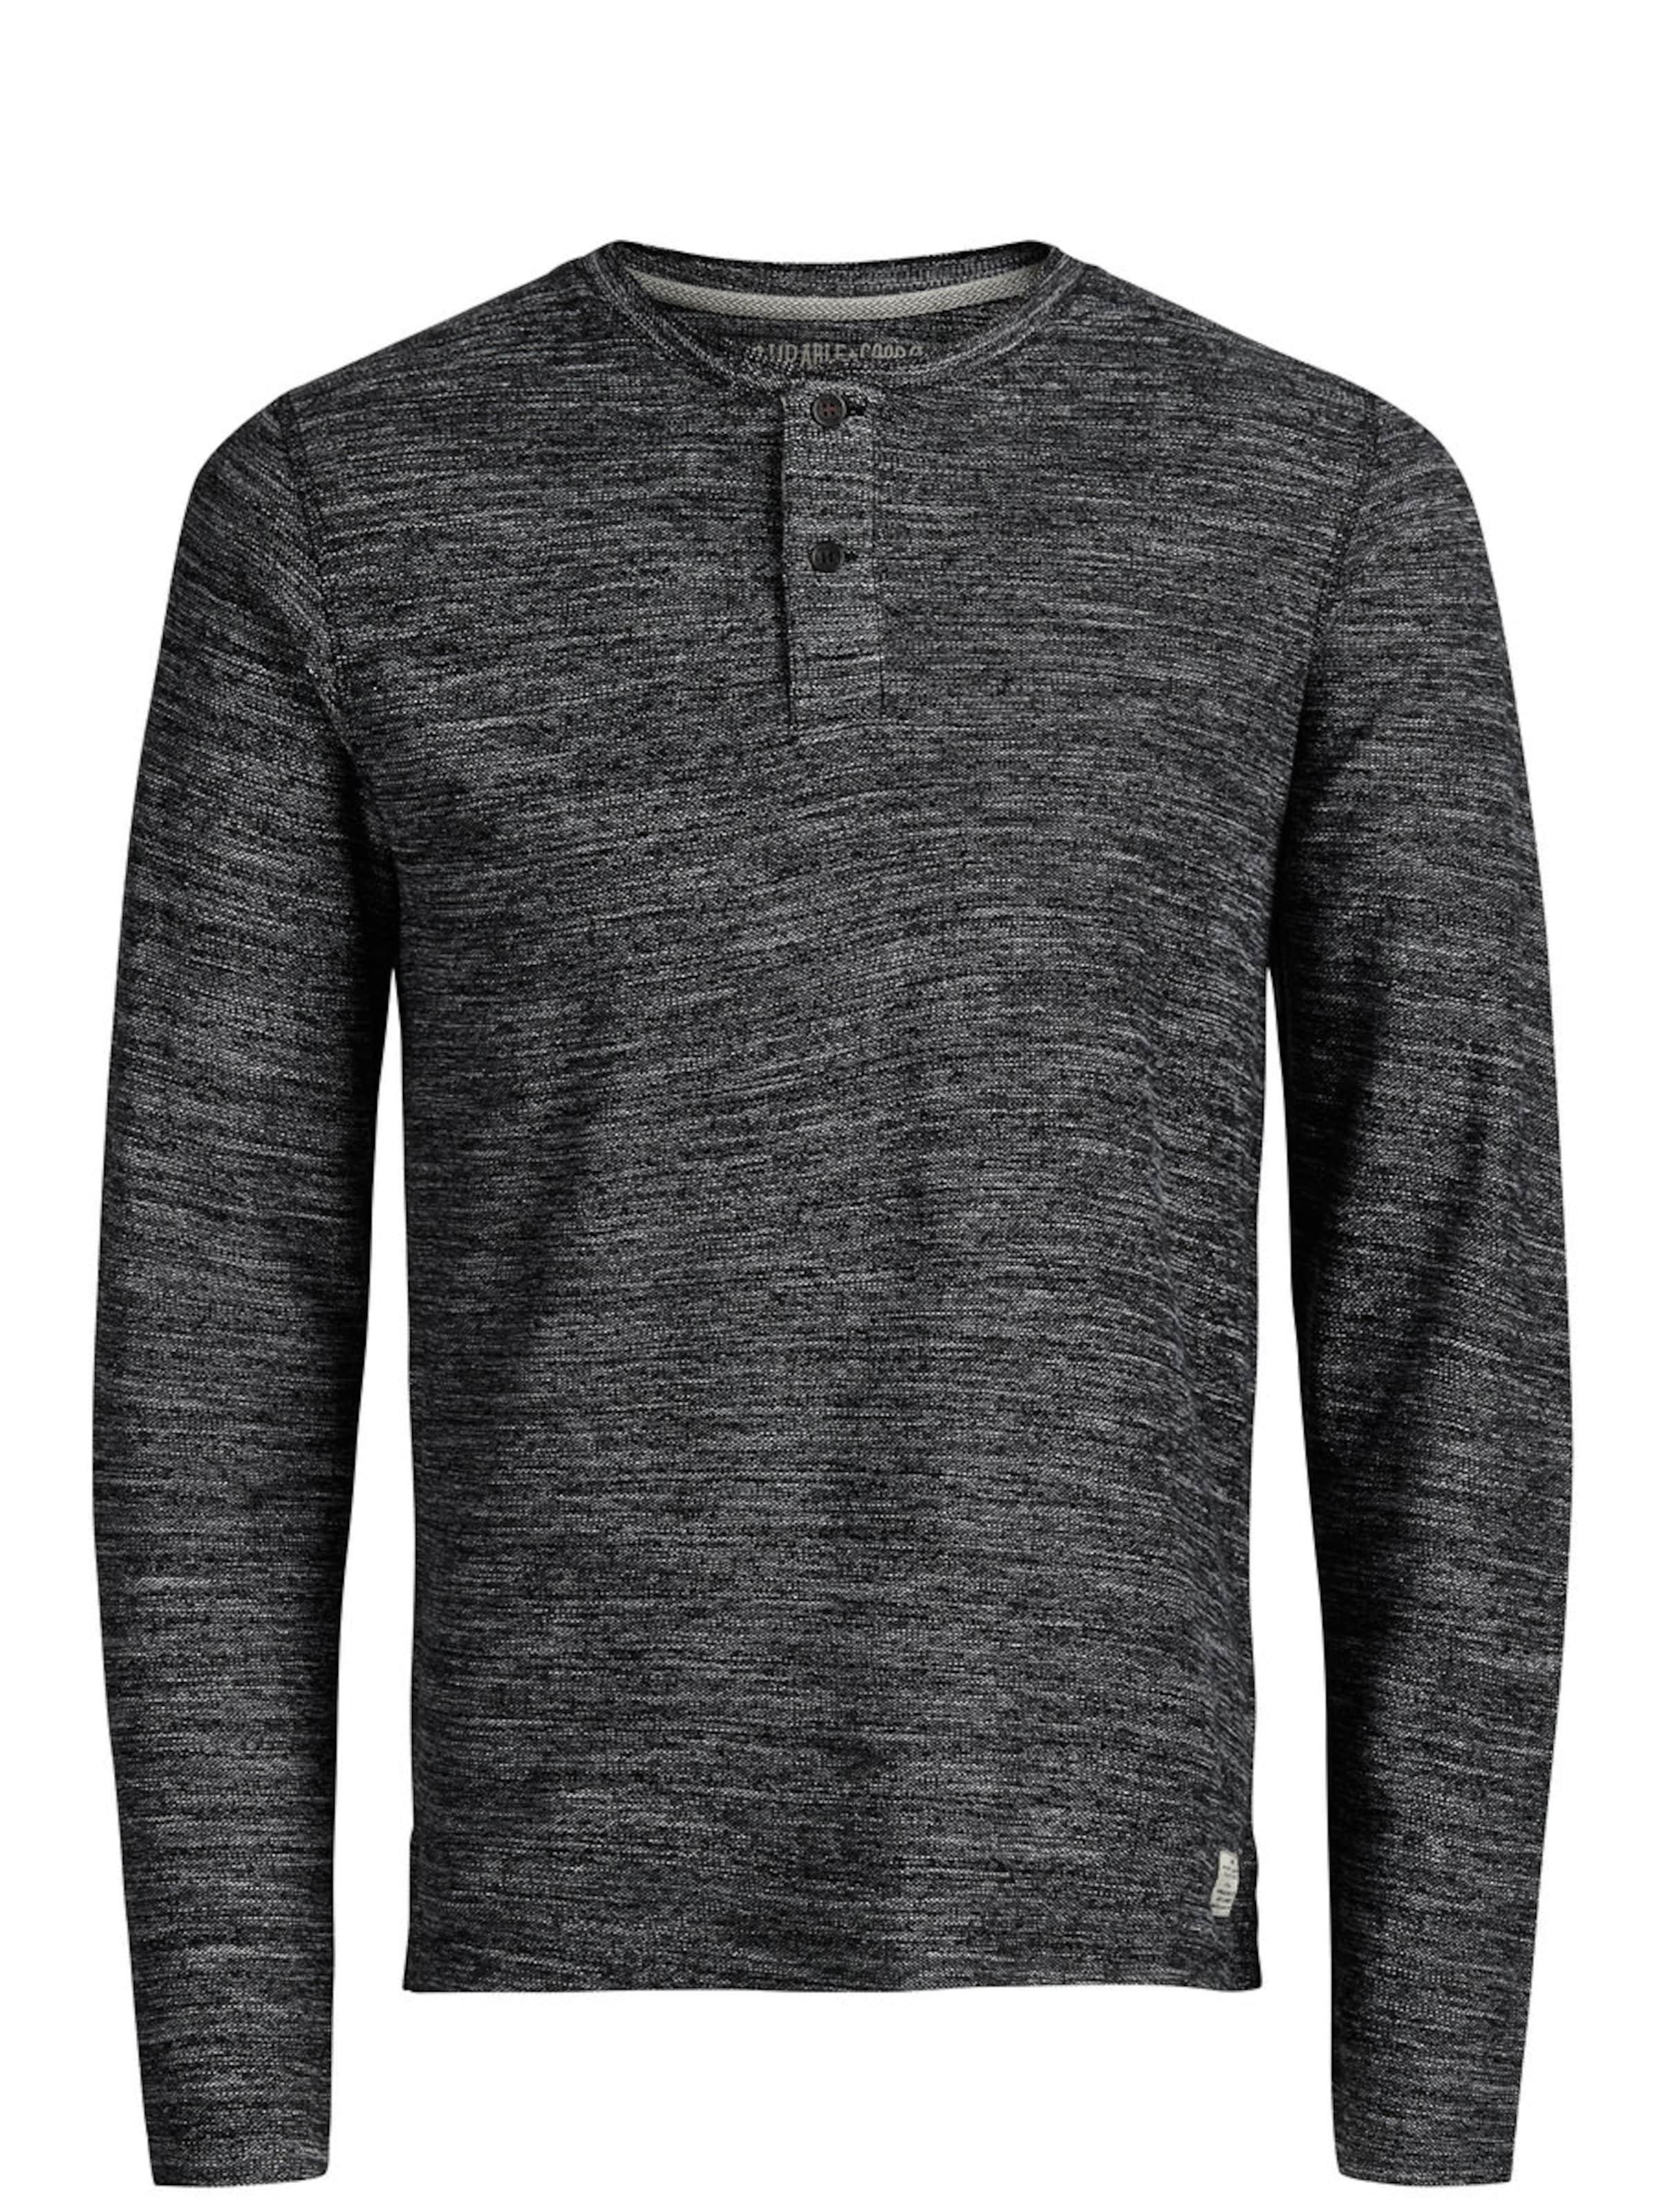 JACK & JONES T-Shirt mit langen Ärmeln Billig 2018 Neu q7vHWd9